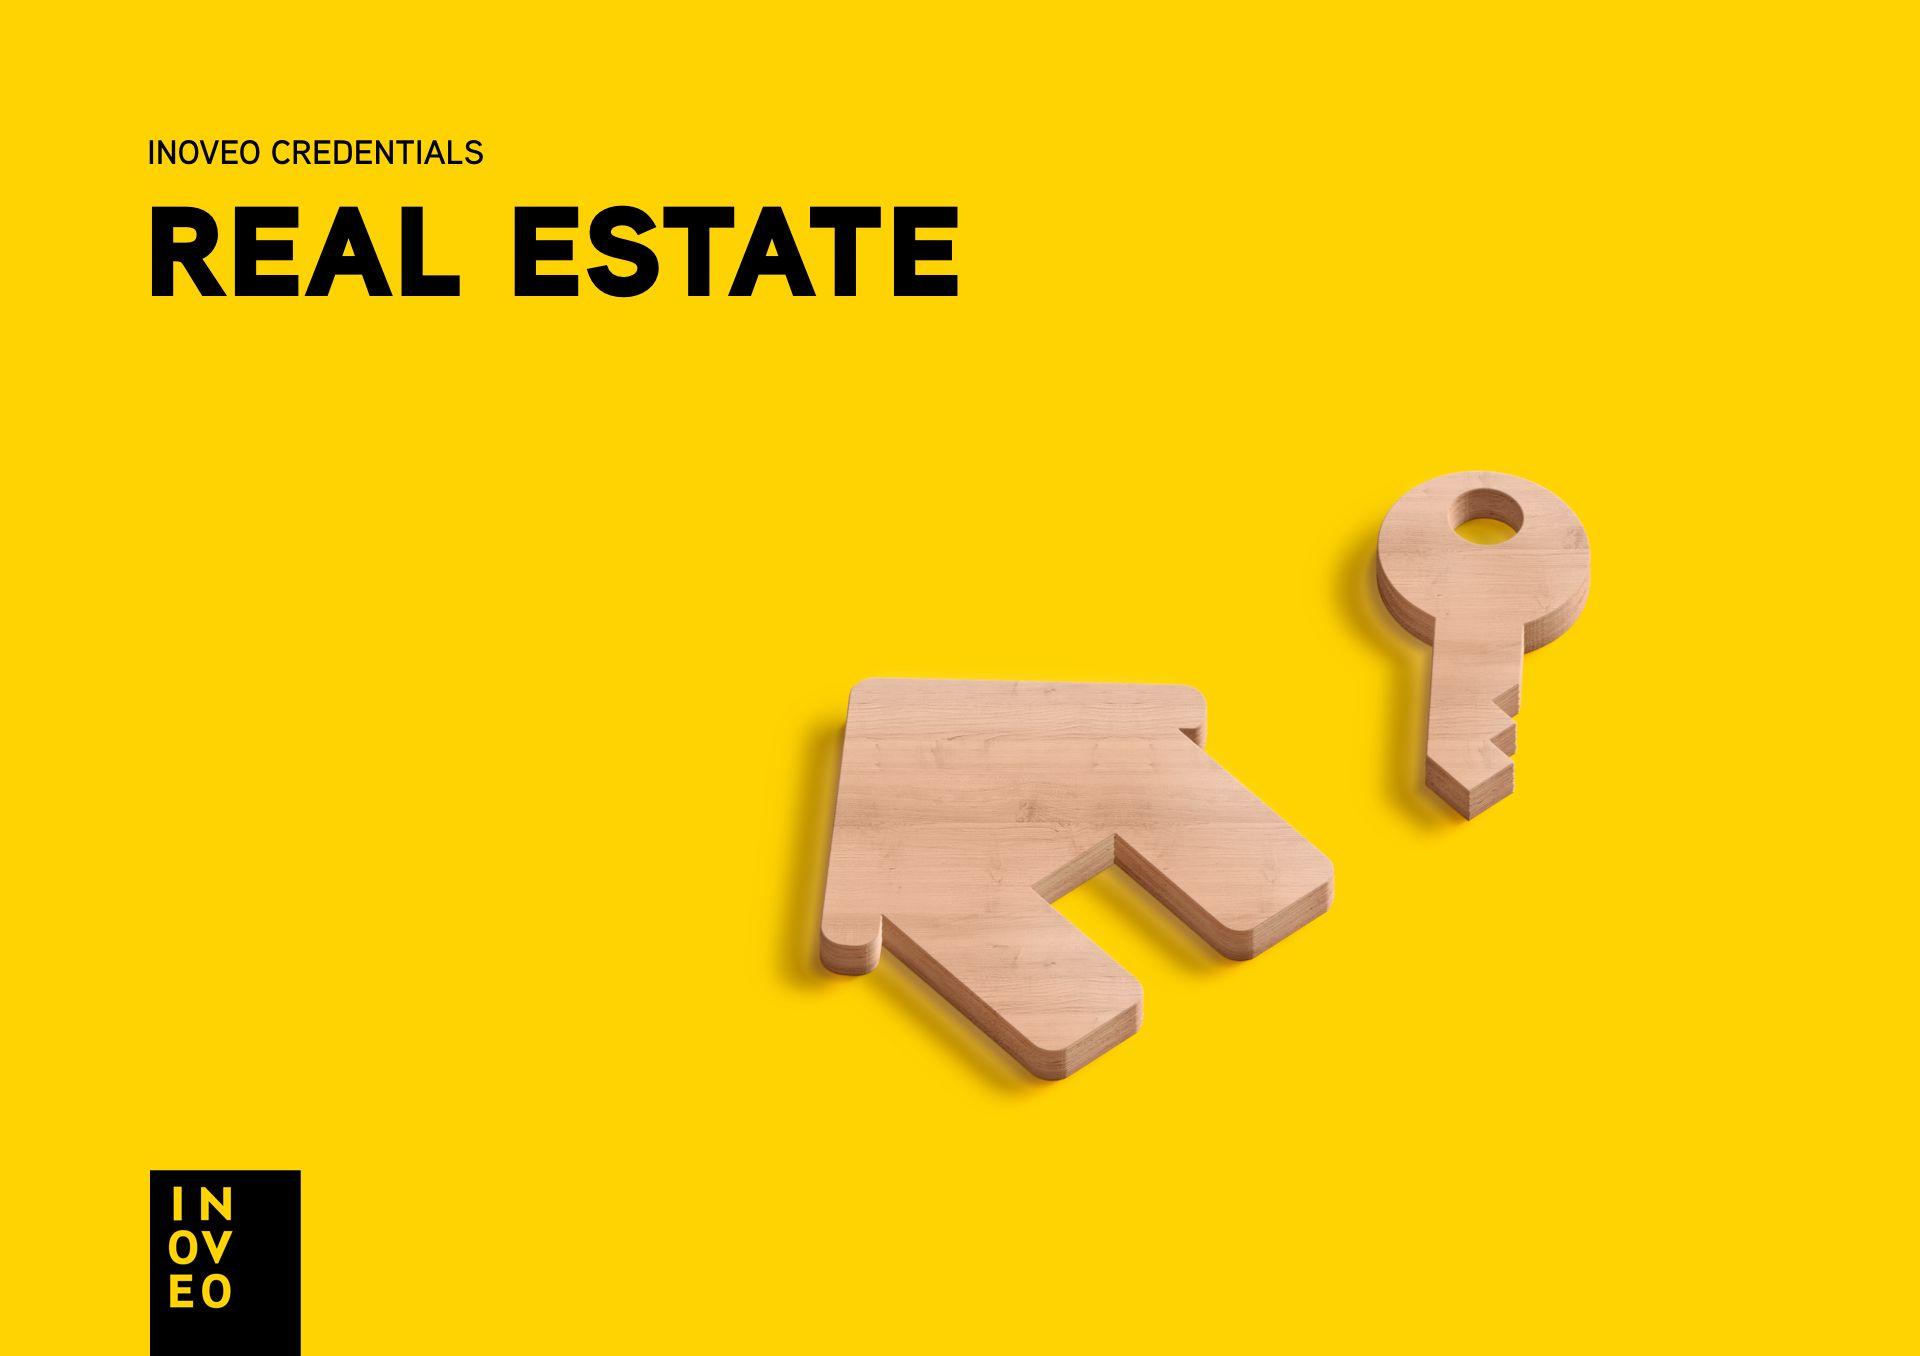 real estate credentials INOVEO branding